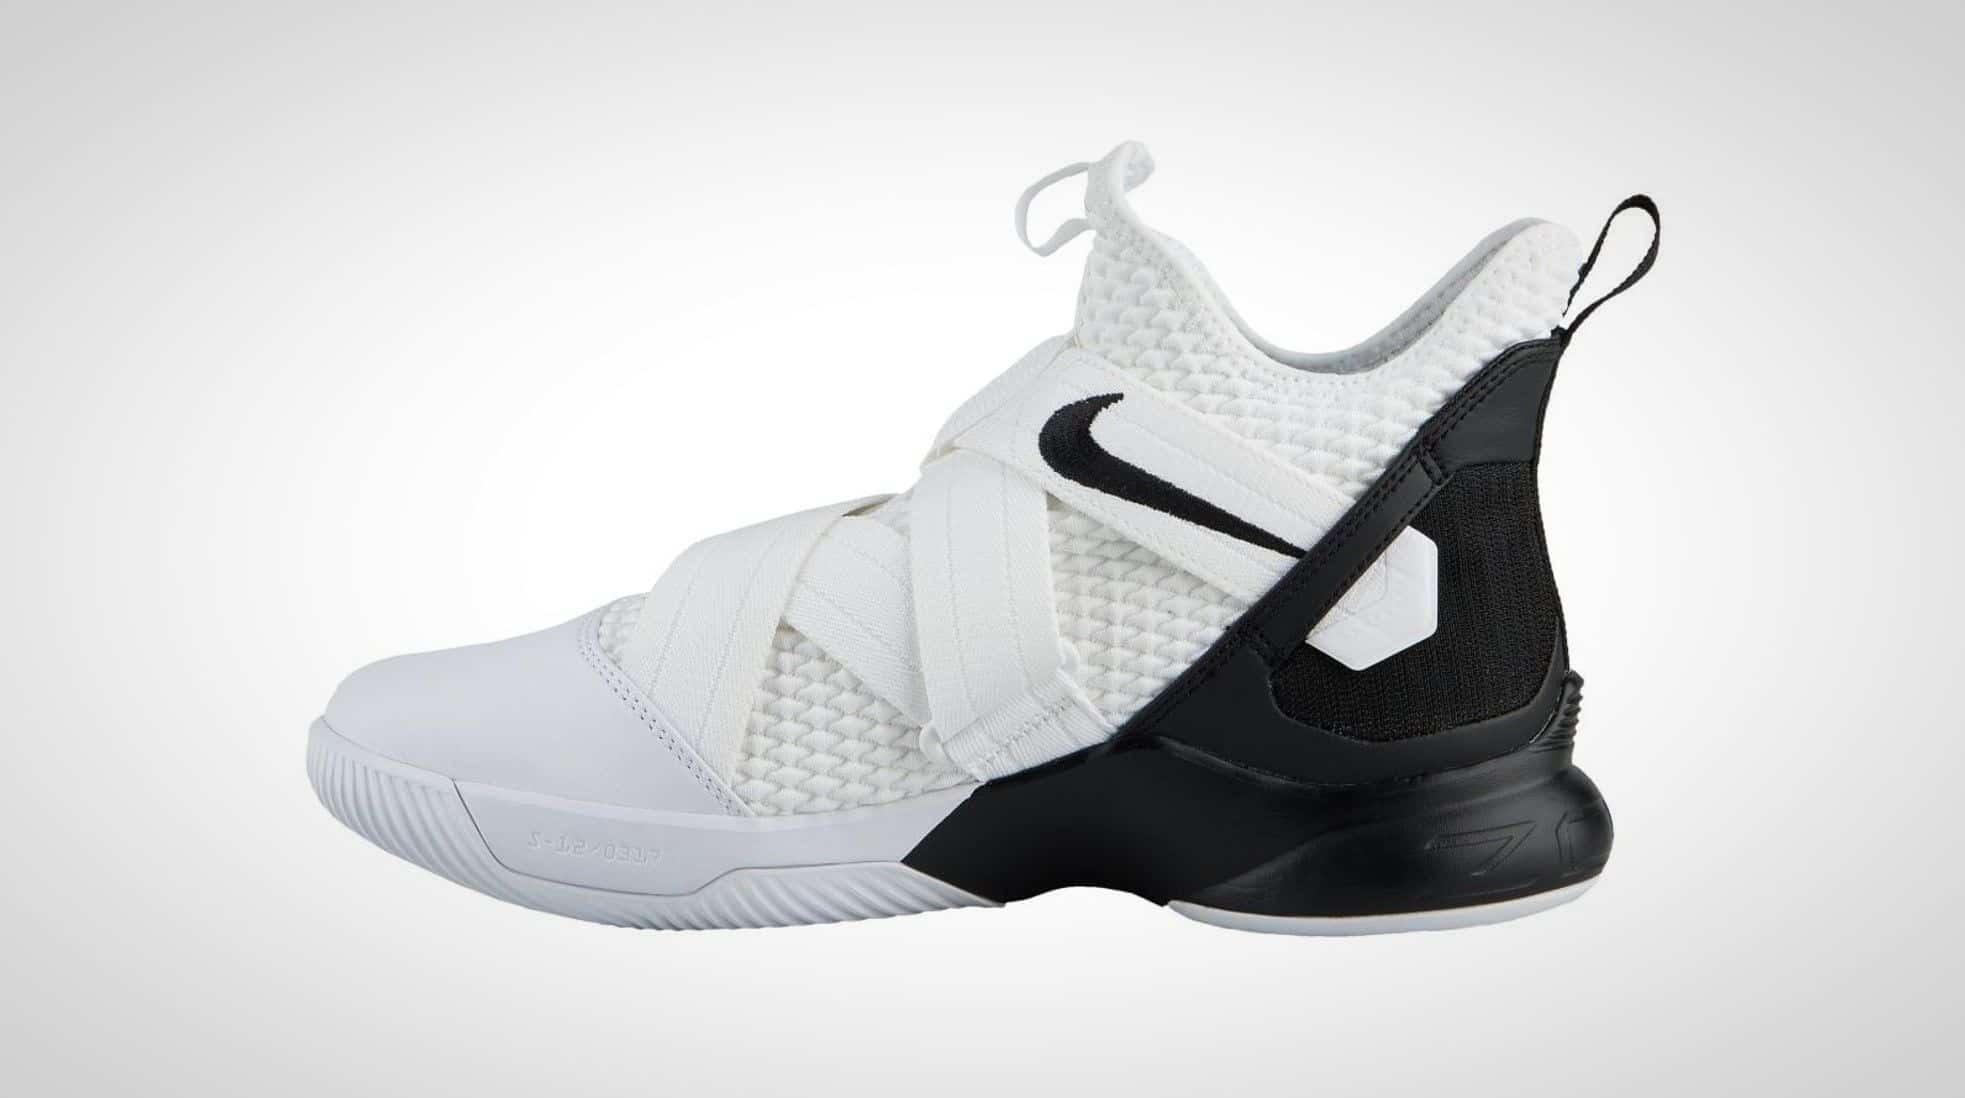 26f43bc322b Nike Lebron Soldier 12 Shoe Review - BestOutdoorBasketball